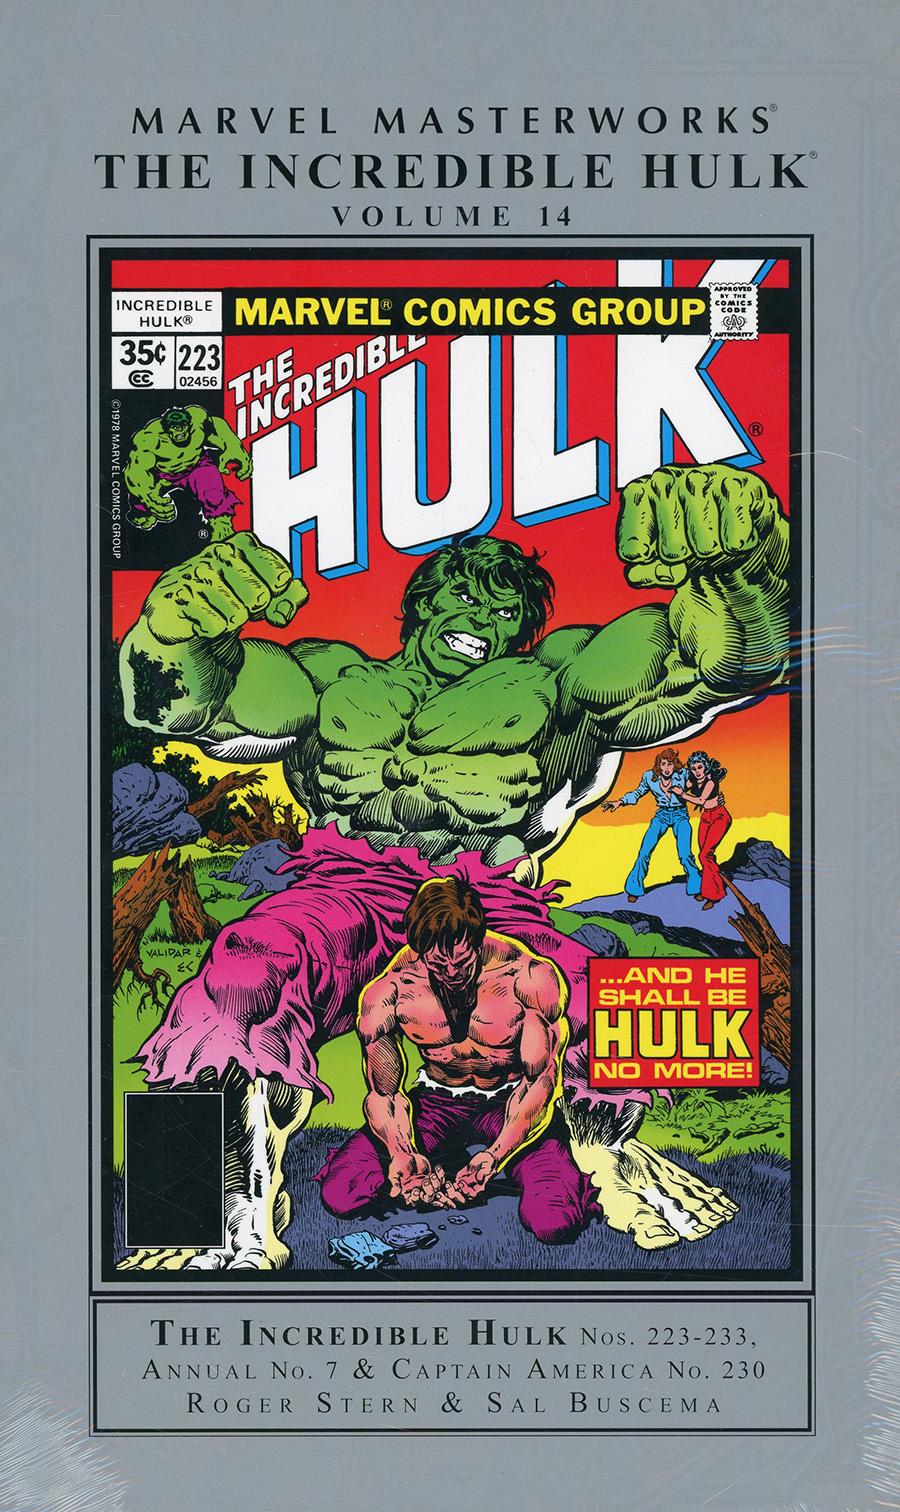 Marvel Masterworks Incredible Hulk Vol 14 HC Regular Dust Jacket